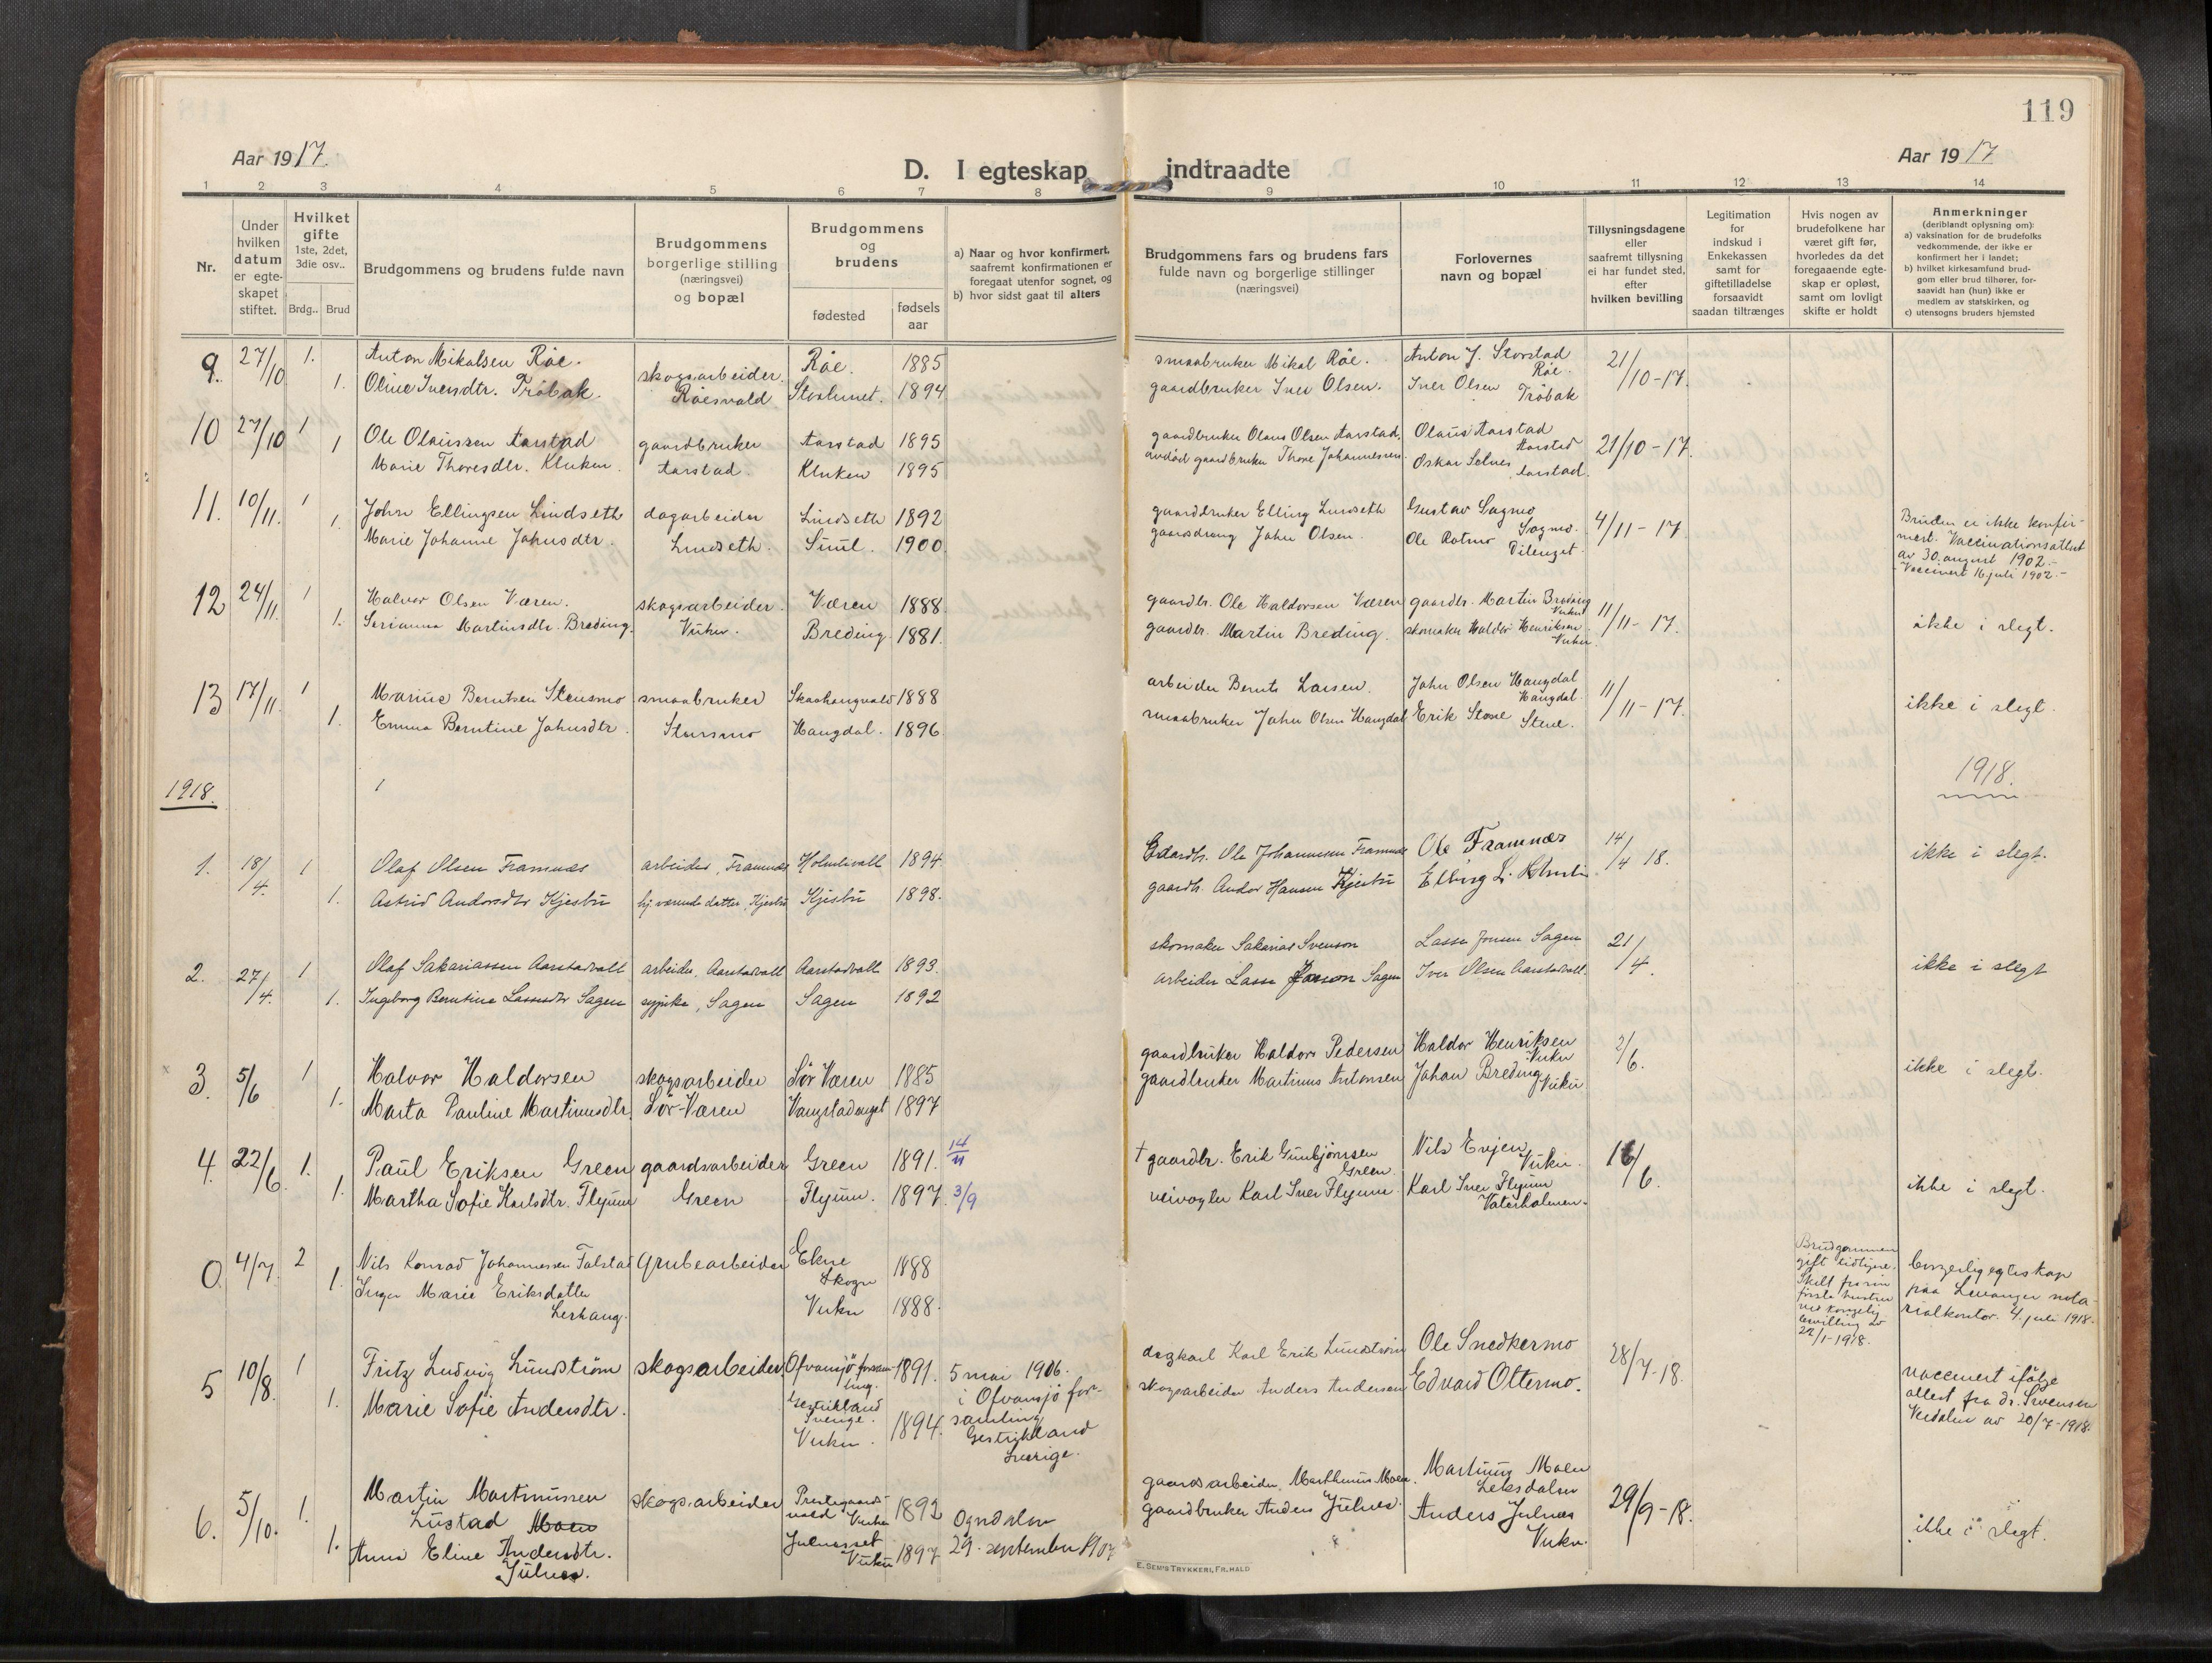 SAT, Verdal sokneprestkontor, H/Haa/L0004: Ministerialbok nr. 4, 1916-1928, s. 119